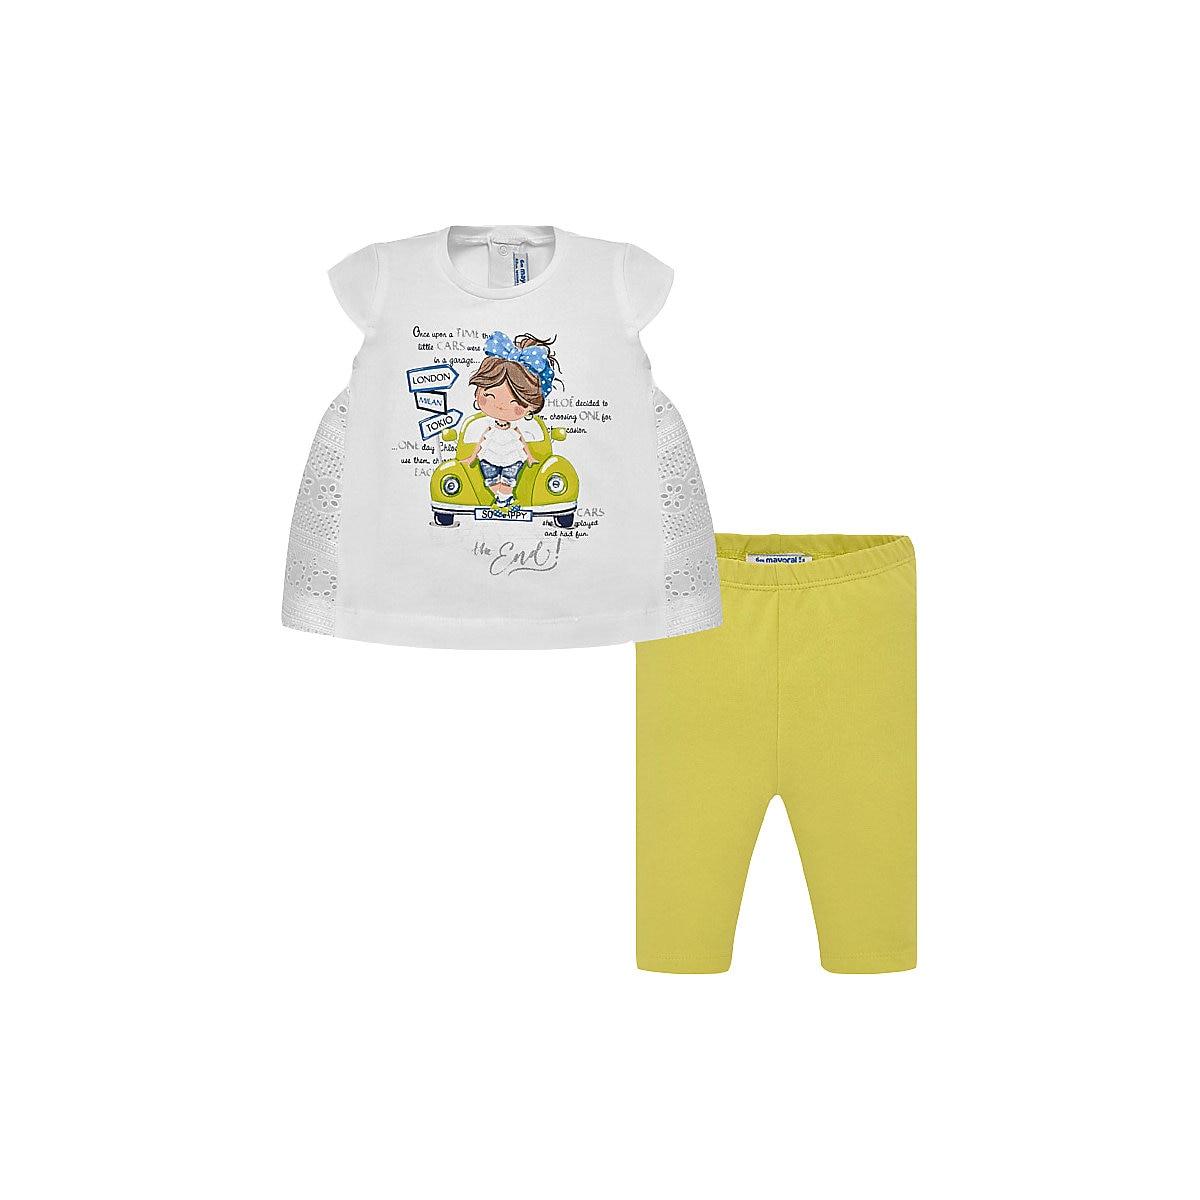 MAYORAL Babys Sets 10682329 Cotton Girls Fashion clothing costume for girl leggings T-shirt